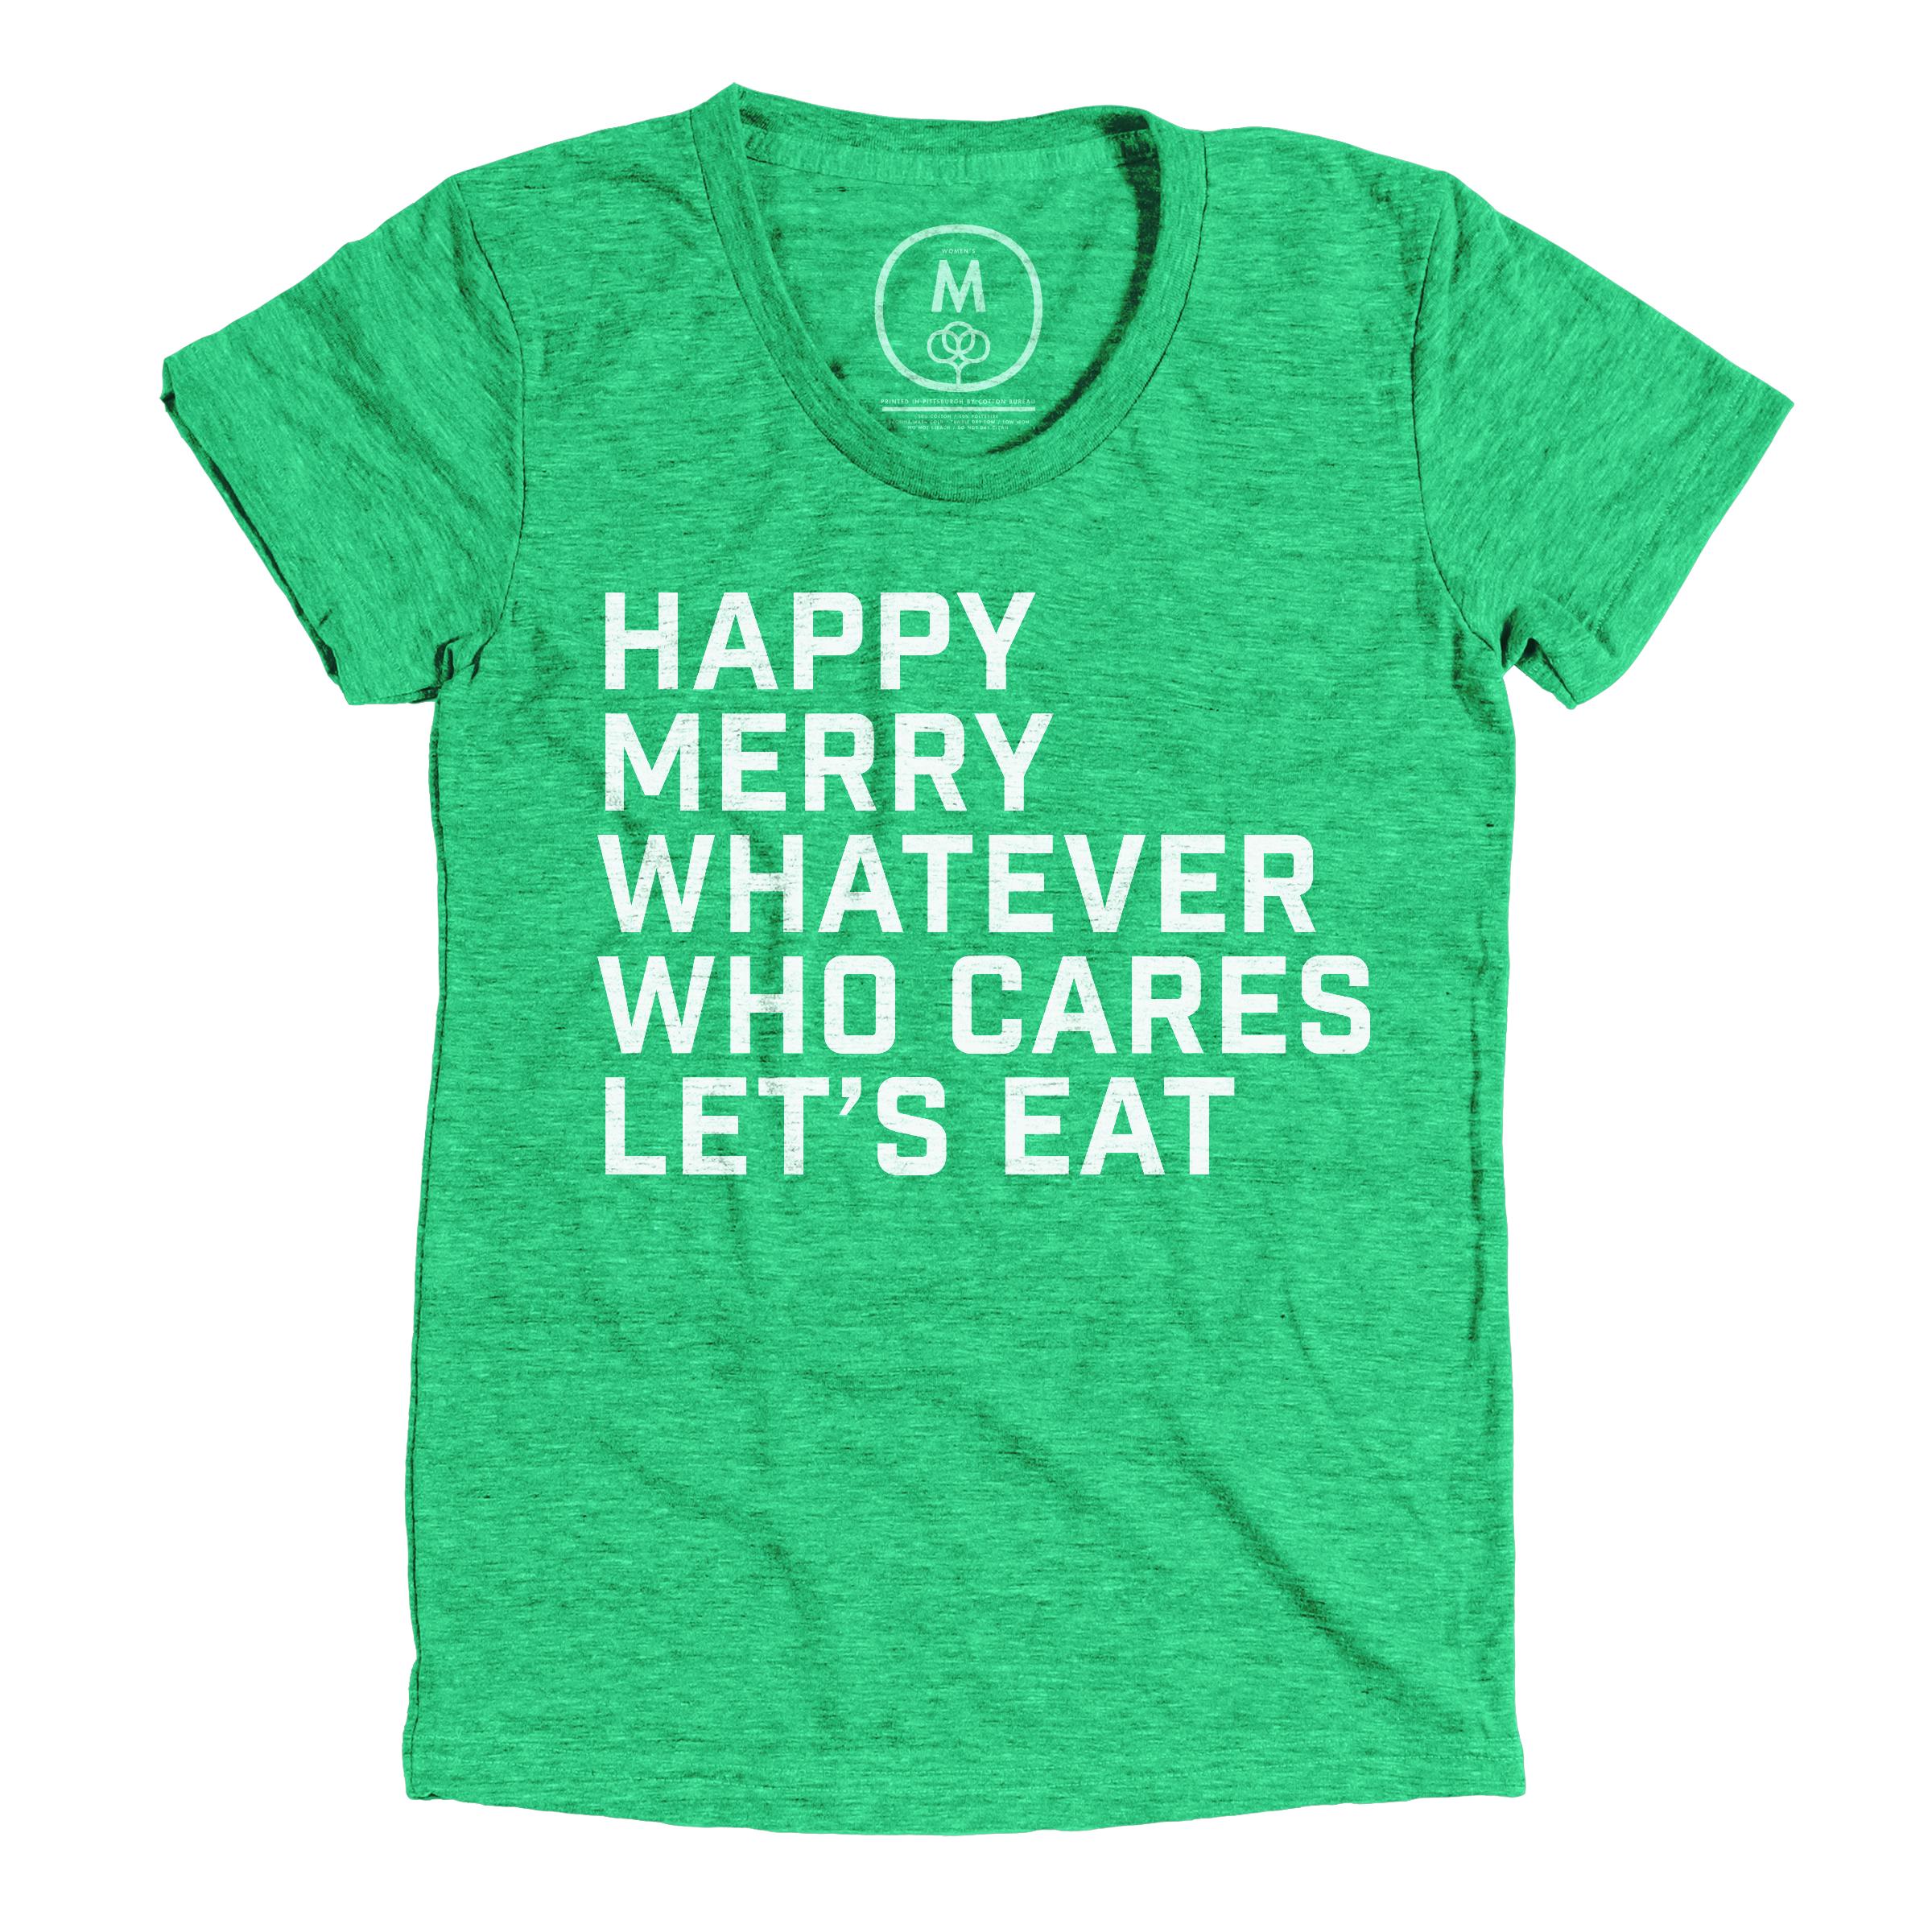 Let's Eat Envy (Women's)